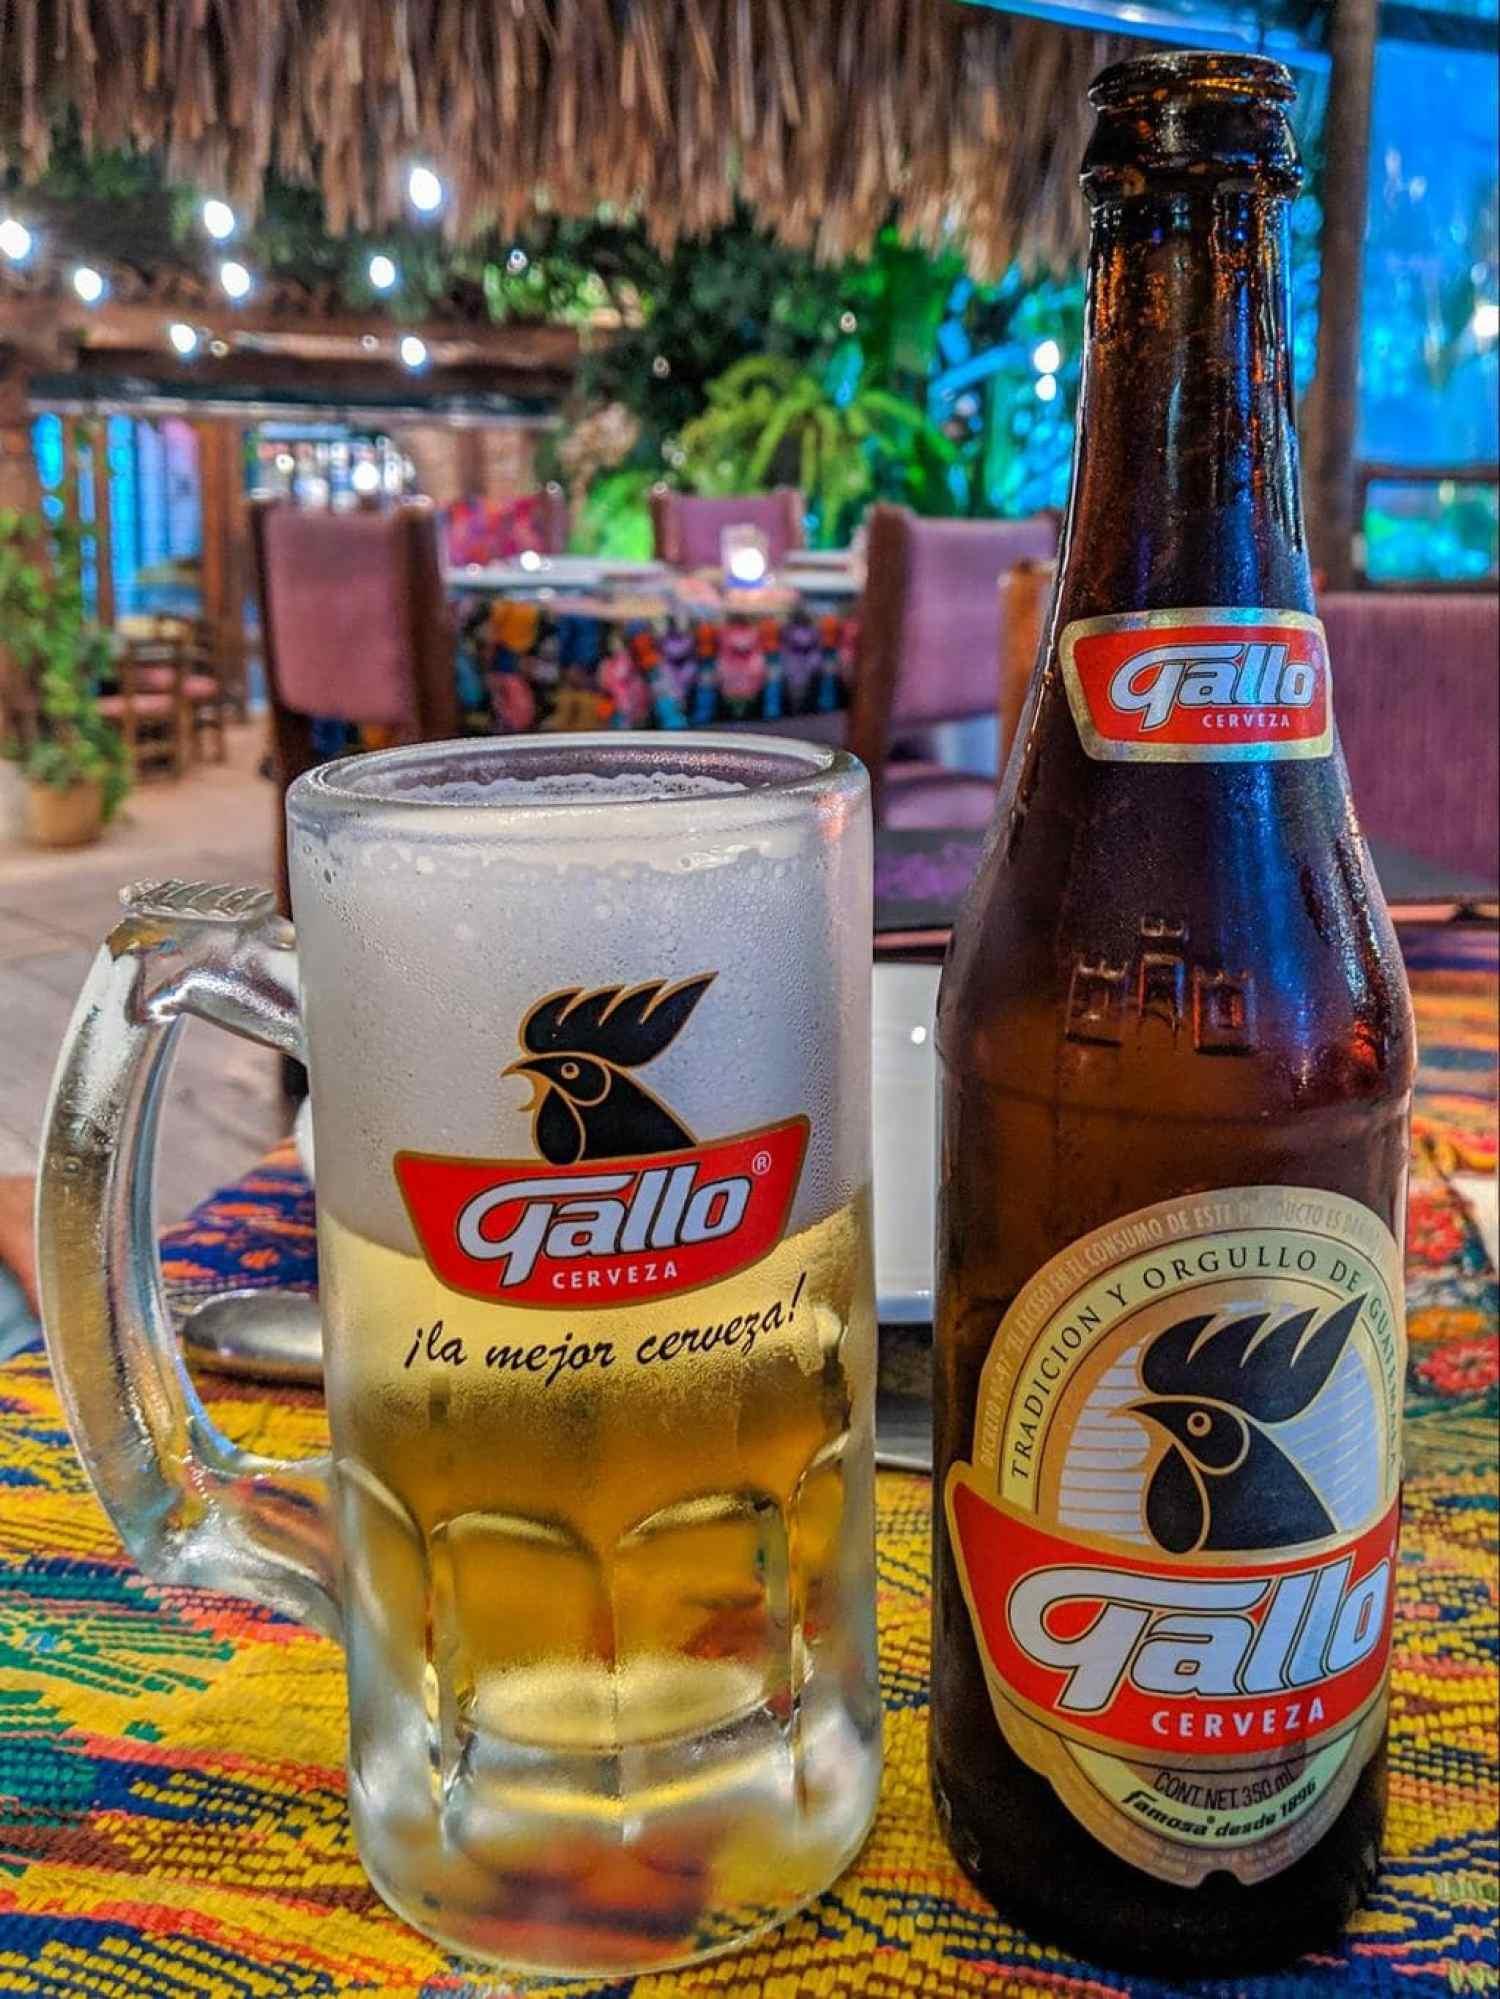 Gallo, Guatemalan beer